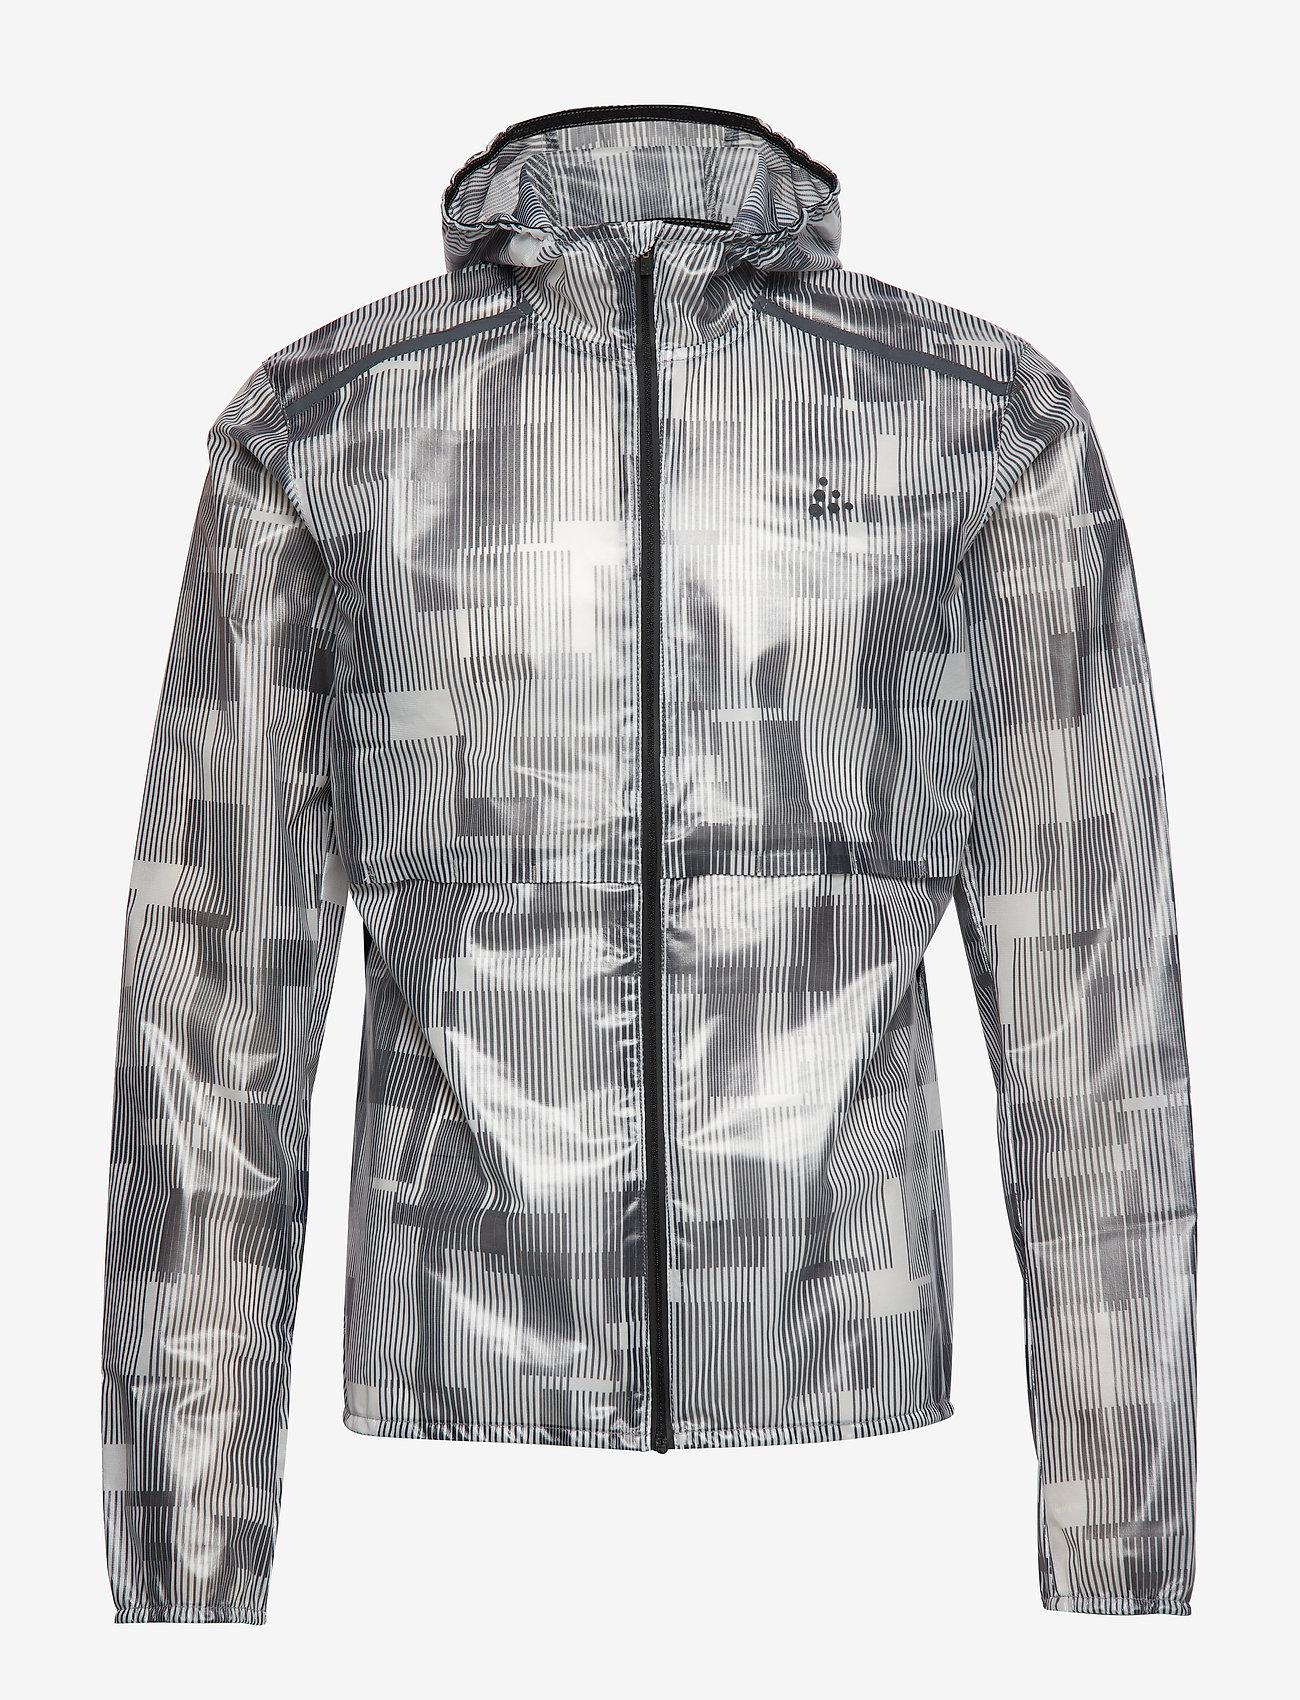 Craft - NANOWEIGHT HOOD JKT M - training jackets - p stack black - 1